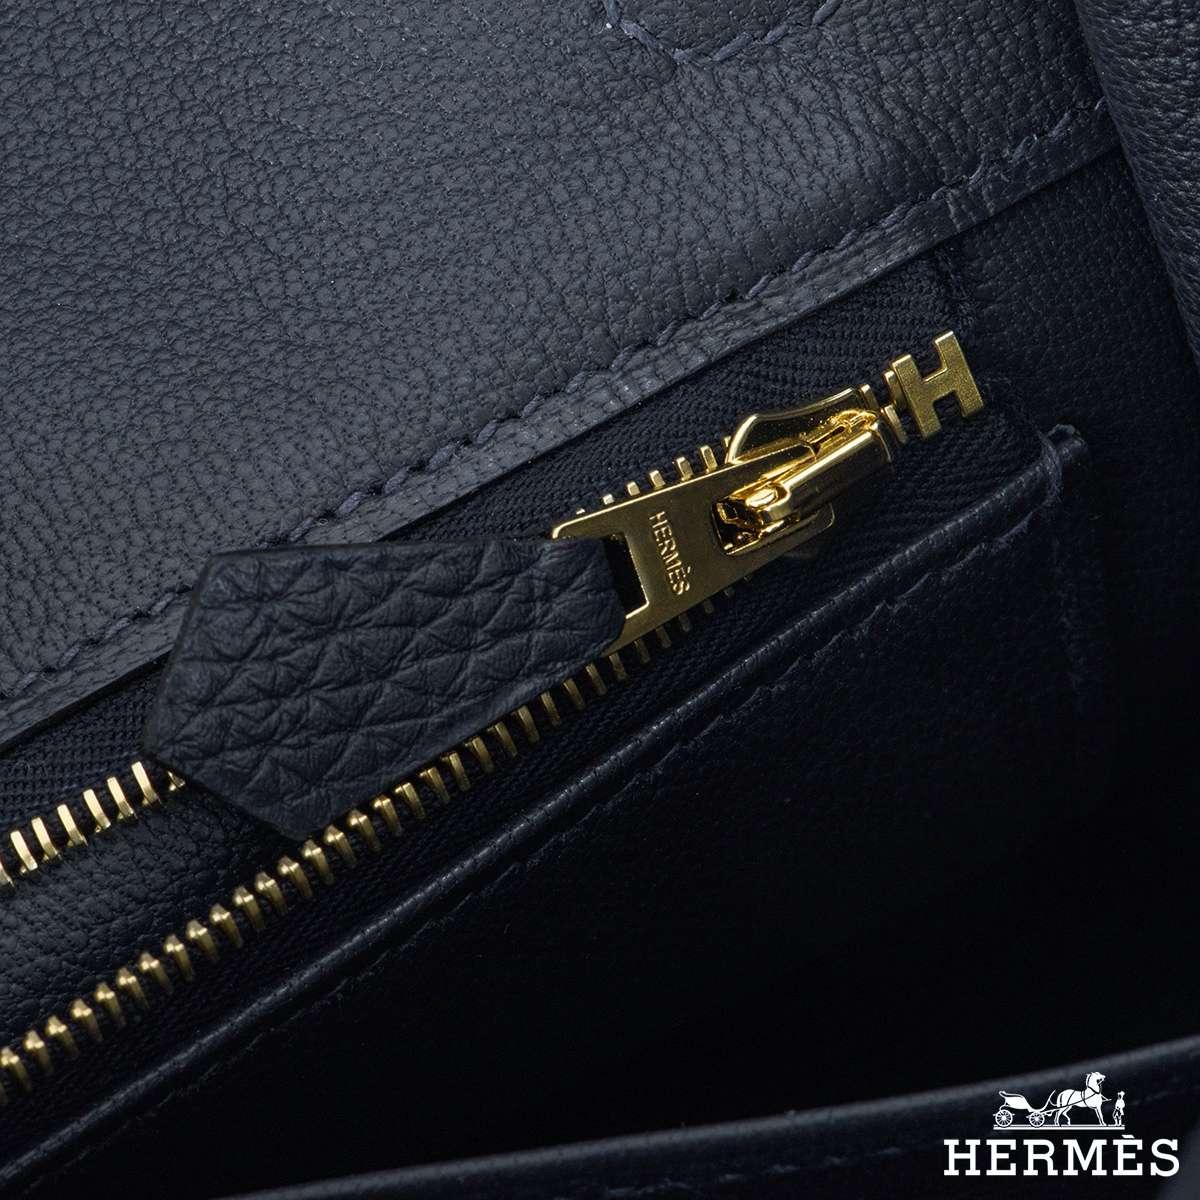 Hermès Bleu Nuit Togo Birkin 25cm Gold Hardware